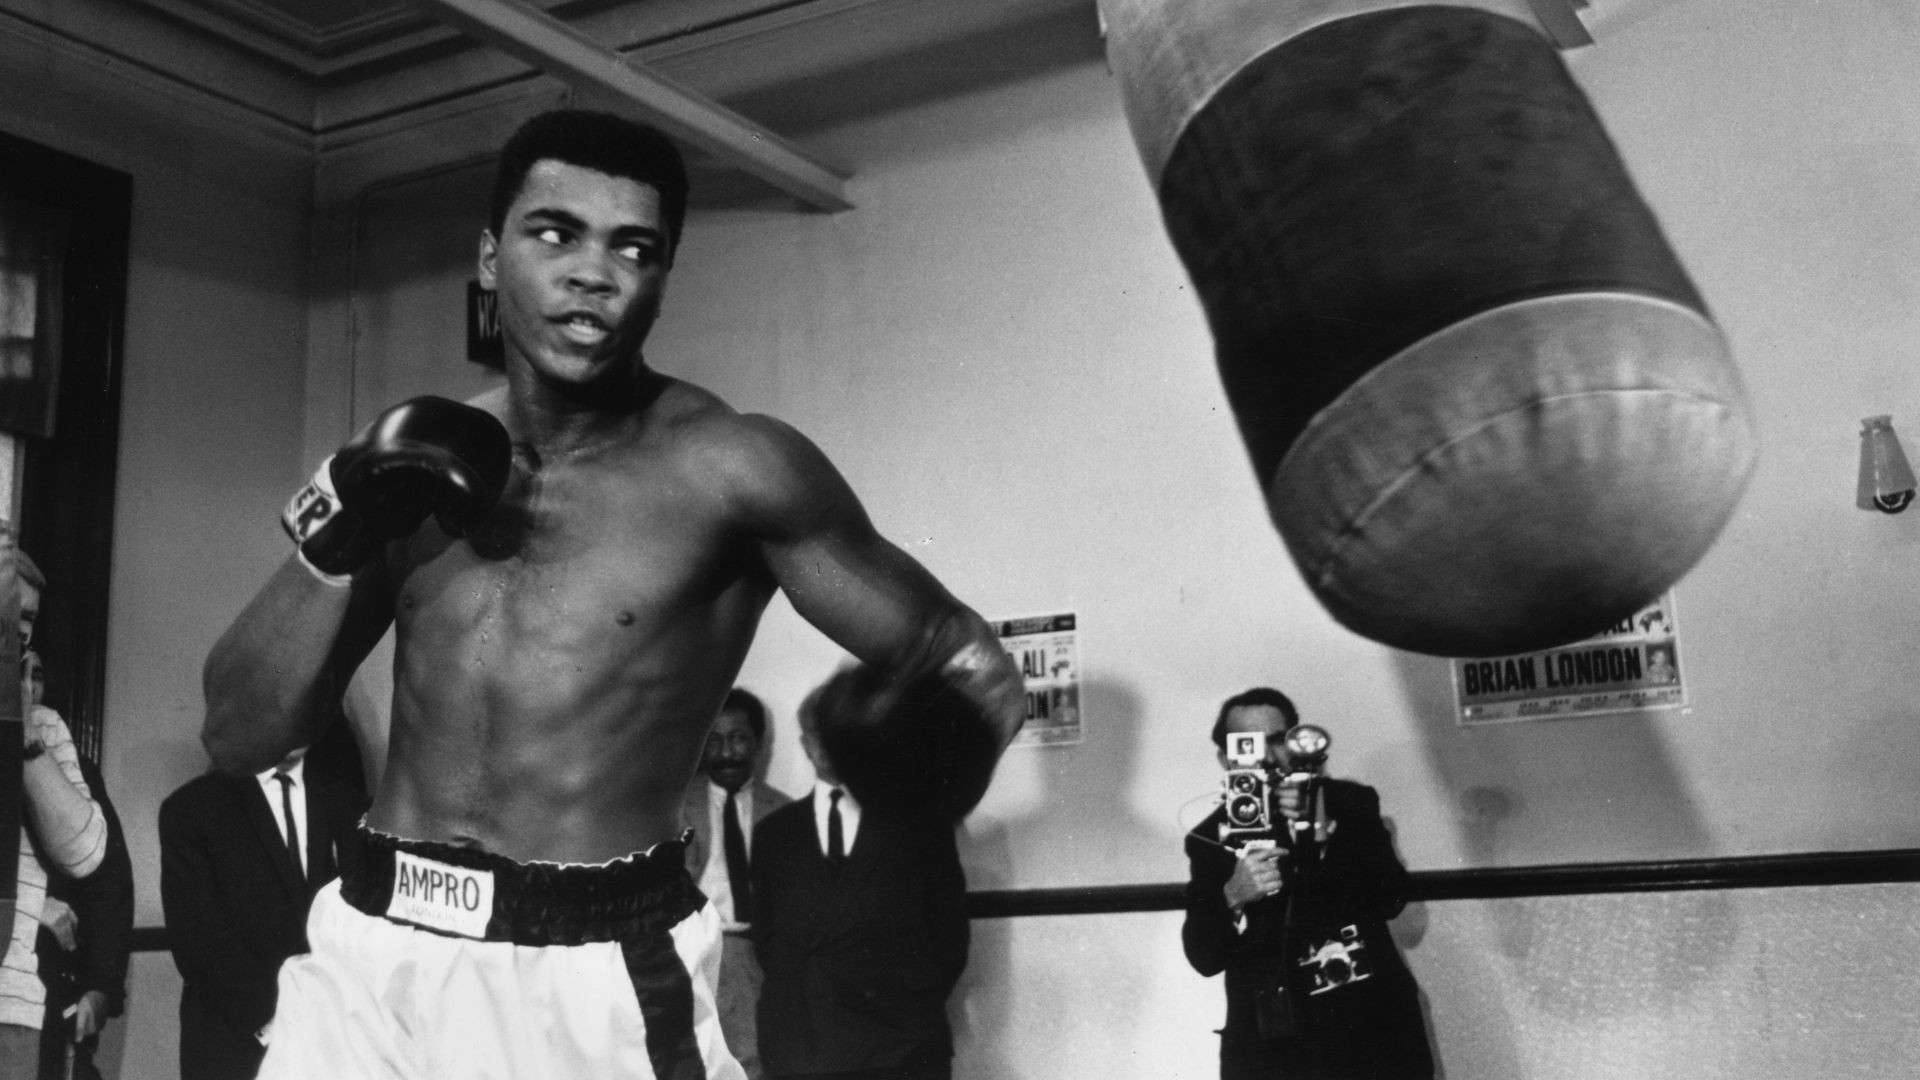 Gambar Mohammad Ali 1920x1080 Muhammad Ali Wallpapers 7 Data Id 300663 Boxing Wallpaper Muhammad Ali 1920x1080 Wallpaper Teahub Io